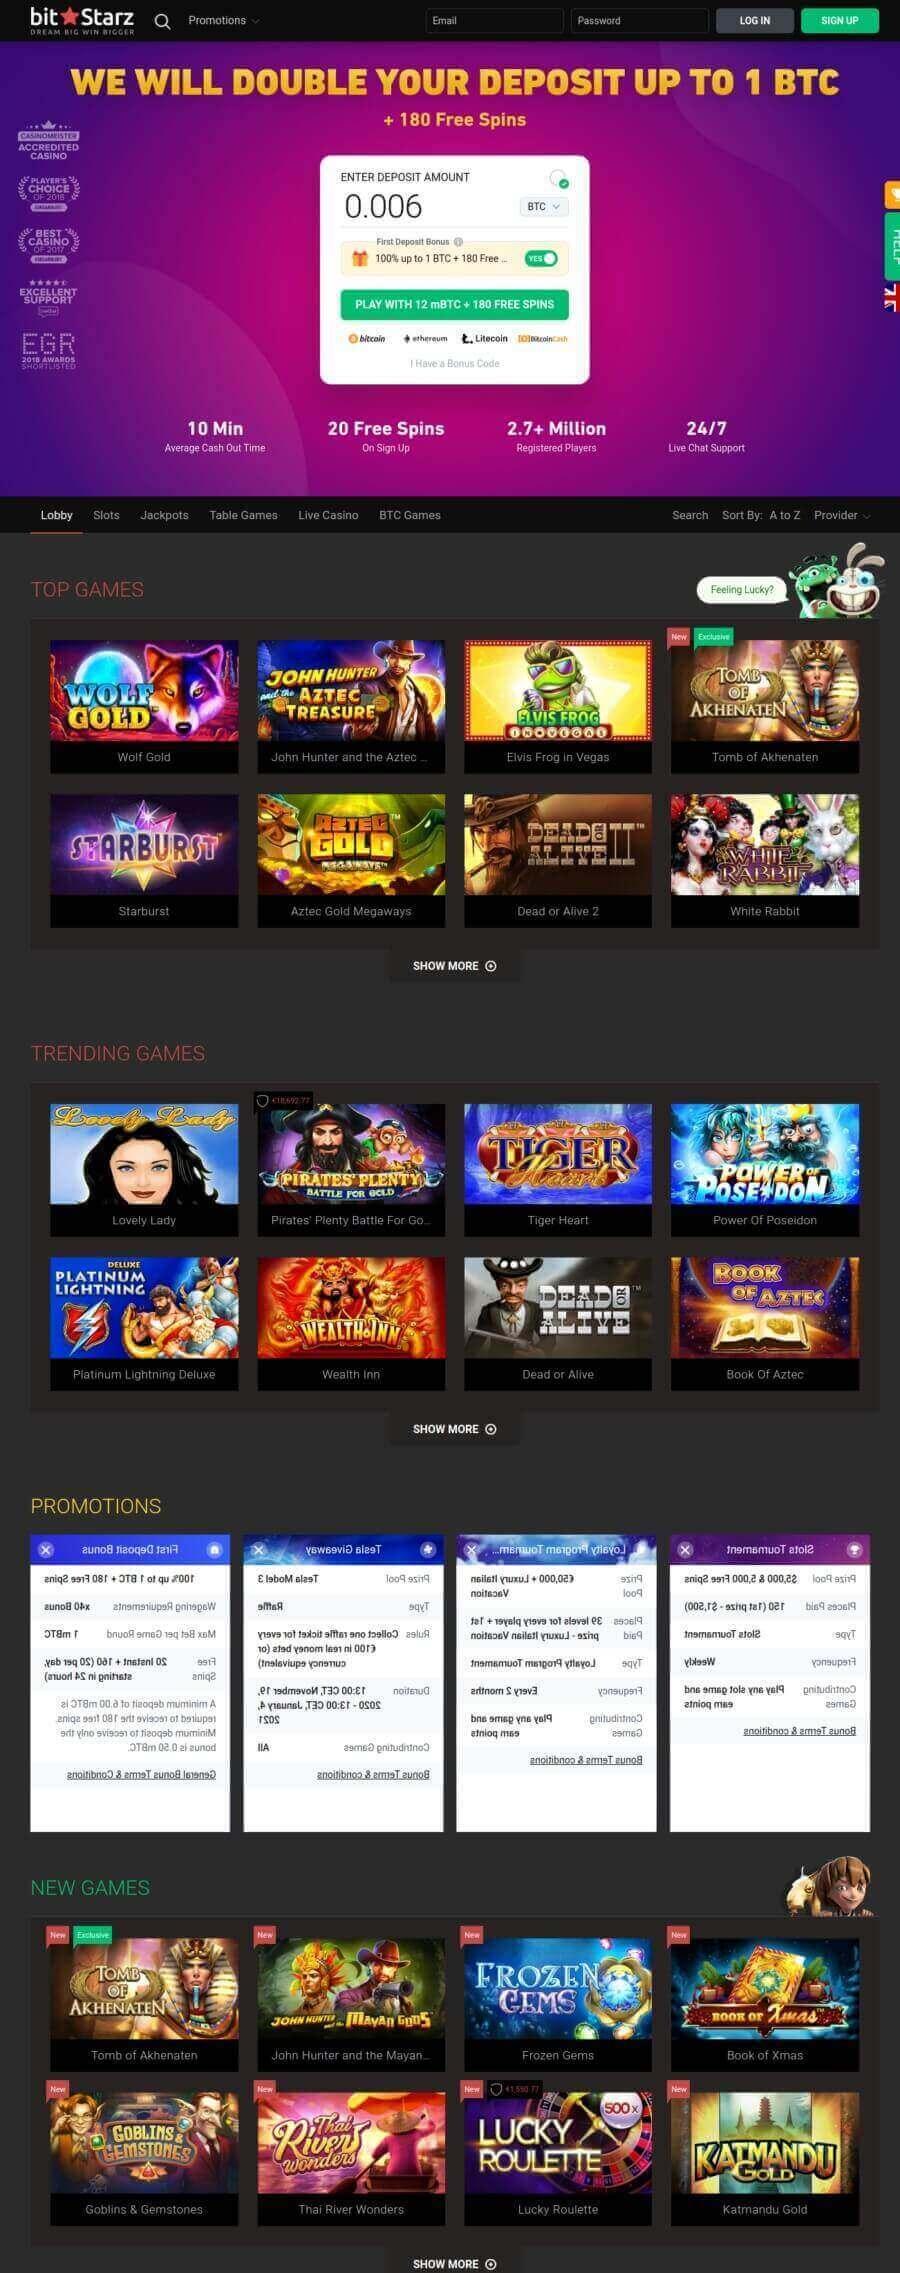 bitstarz casino review 2020